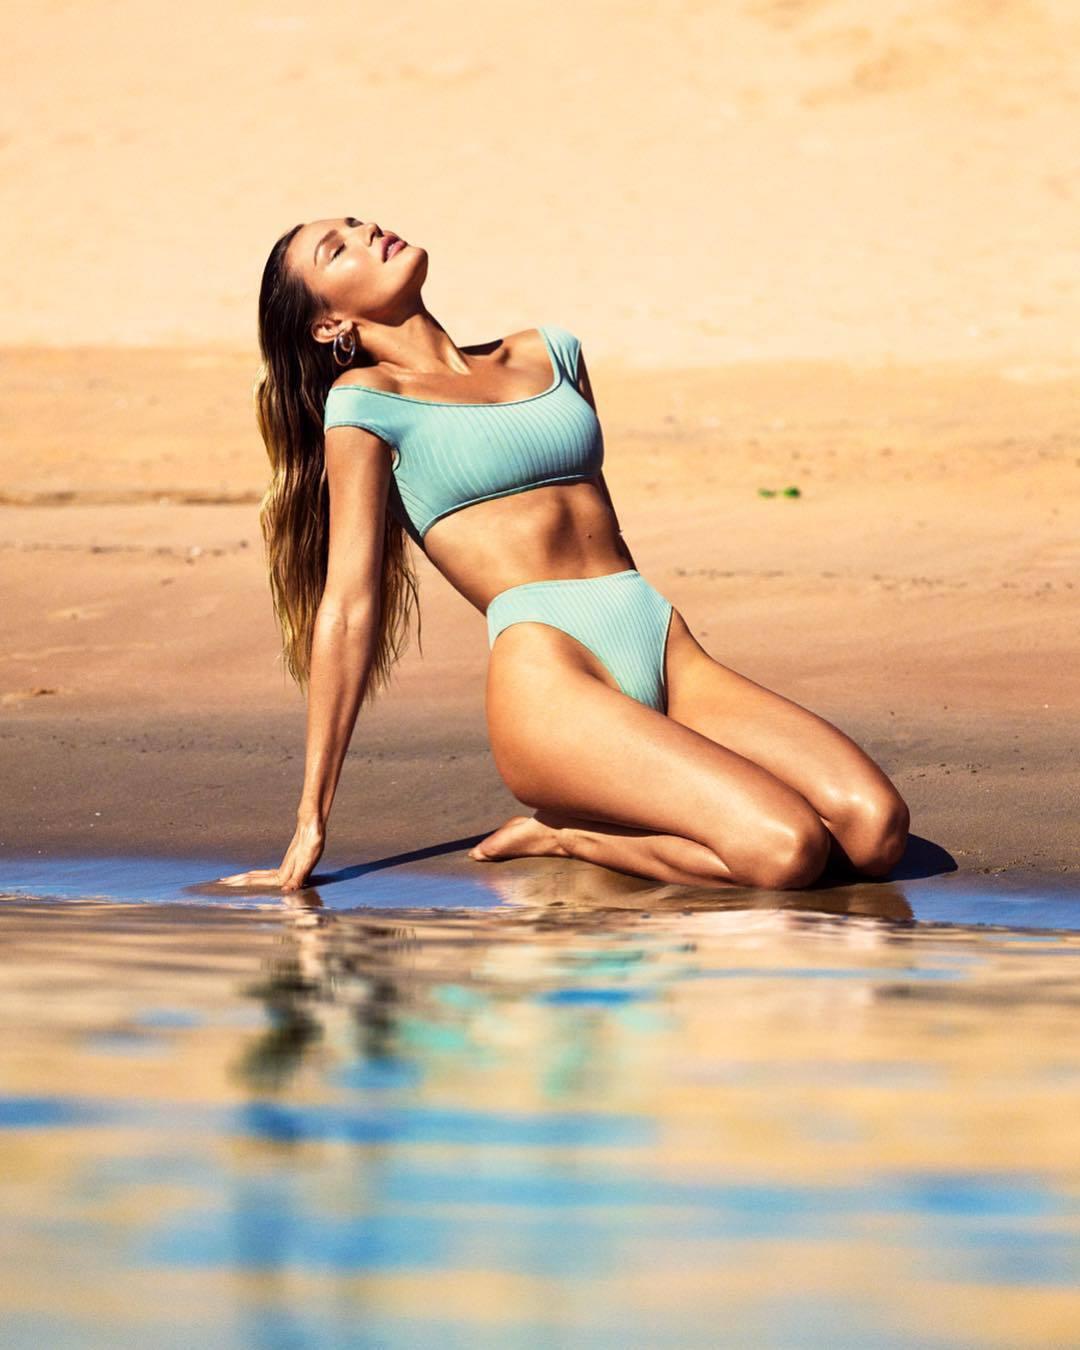 swimwear light blue candice swanepoel bikini top bikini bottoms bikini model